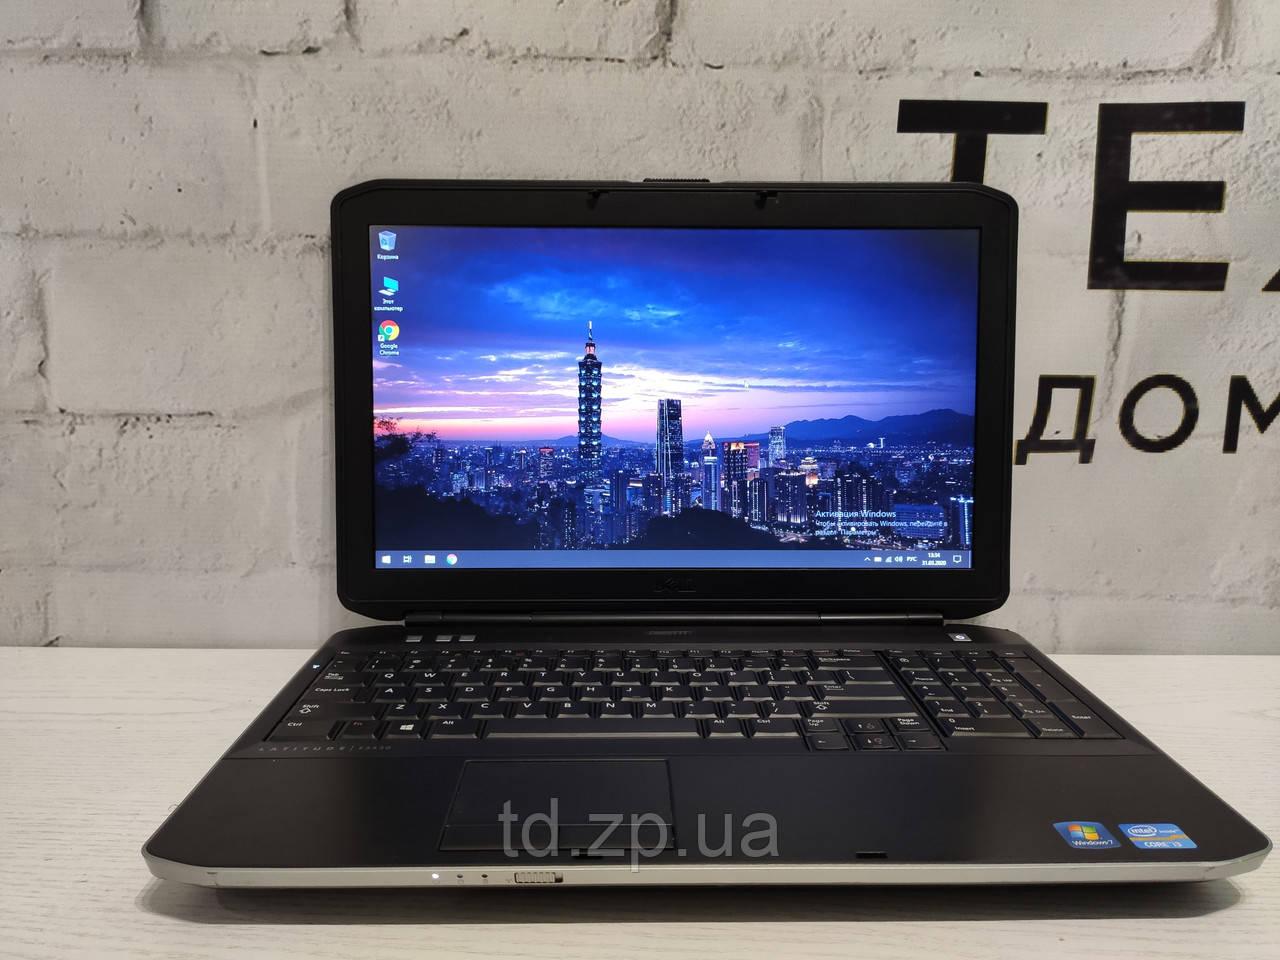 Ноутбук Dell Latitude E5530 15,6'' Intel Core i3 i3-2350M/4Gb DDR3/120Gb SSD / Intel HD 3000